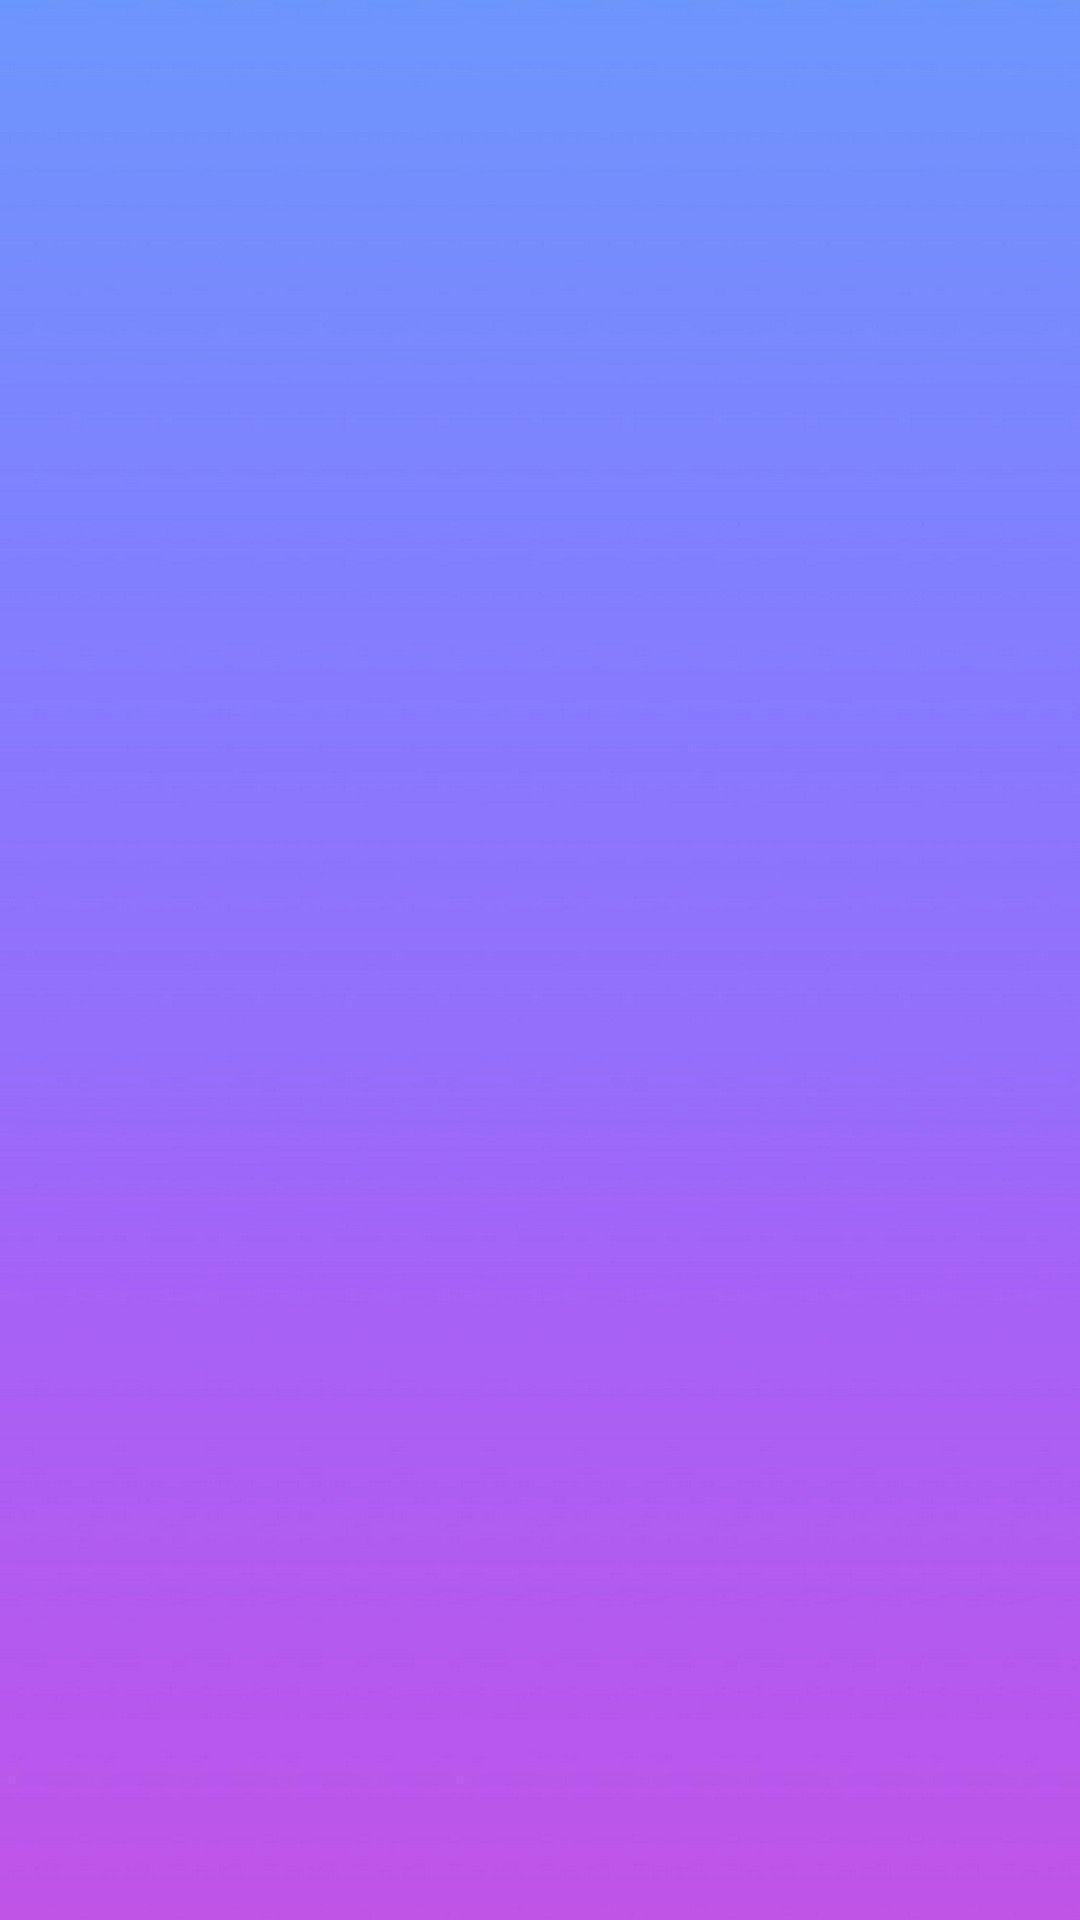 Gradient Iphone Wallpapers Top Free Gradient Iphone Backgrounds Wallpaperaccess